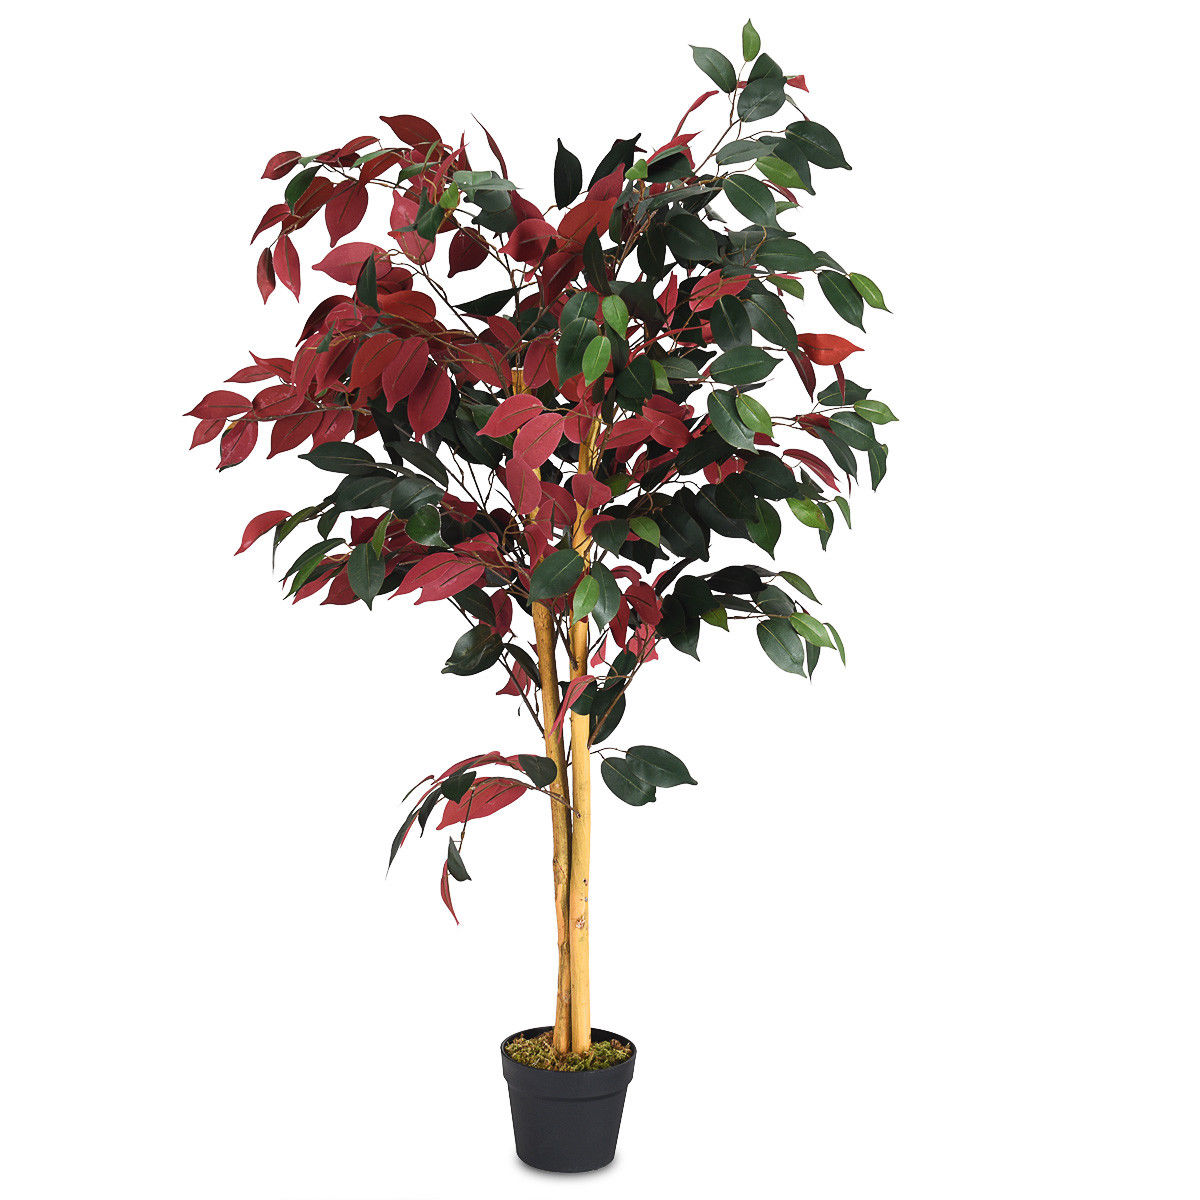 Gymax Artificial Capensia Bush Home Decor 4 Feet Red Green Leaves